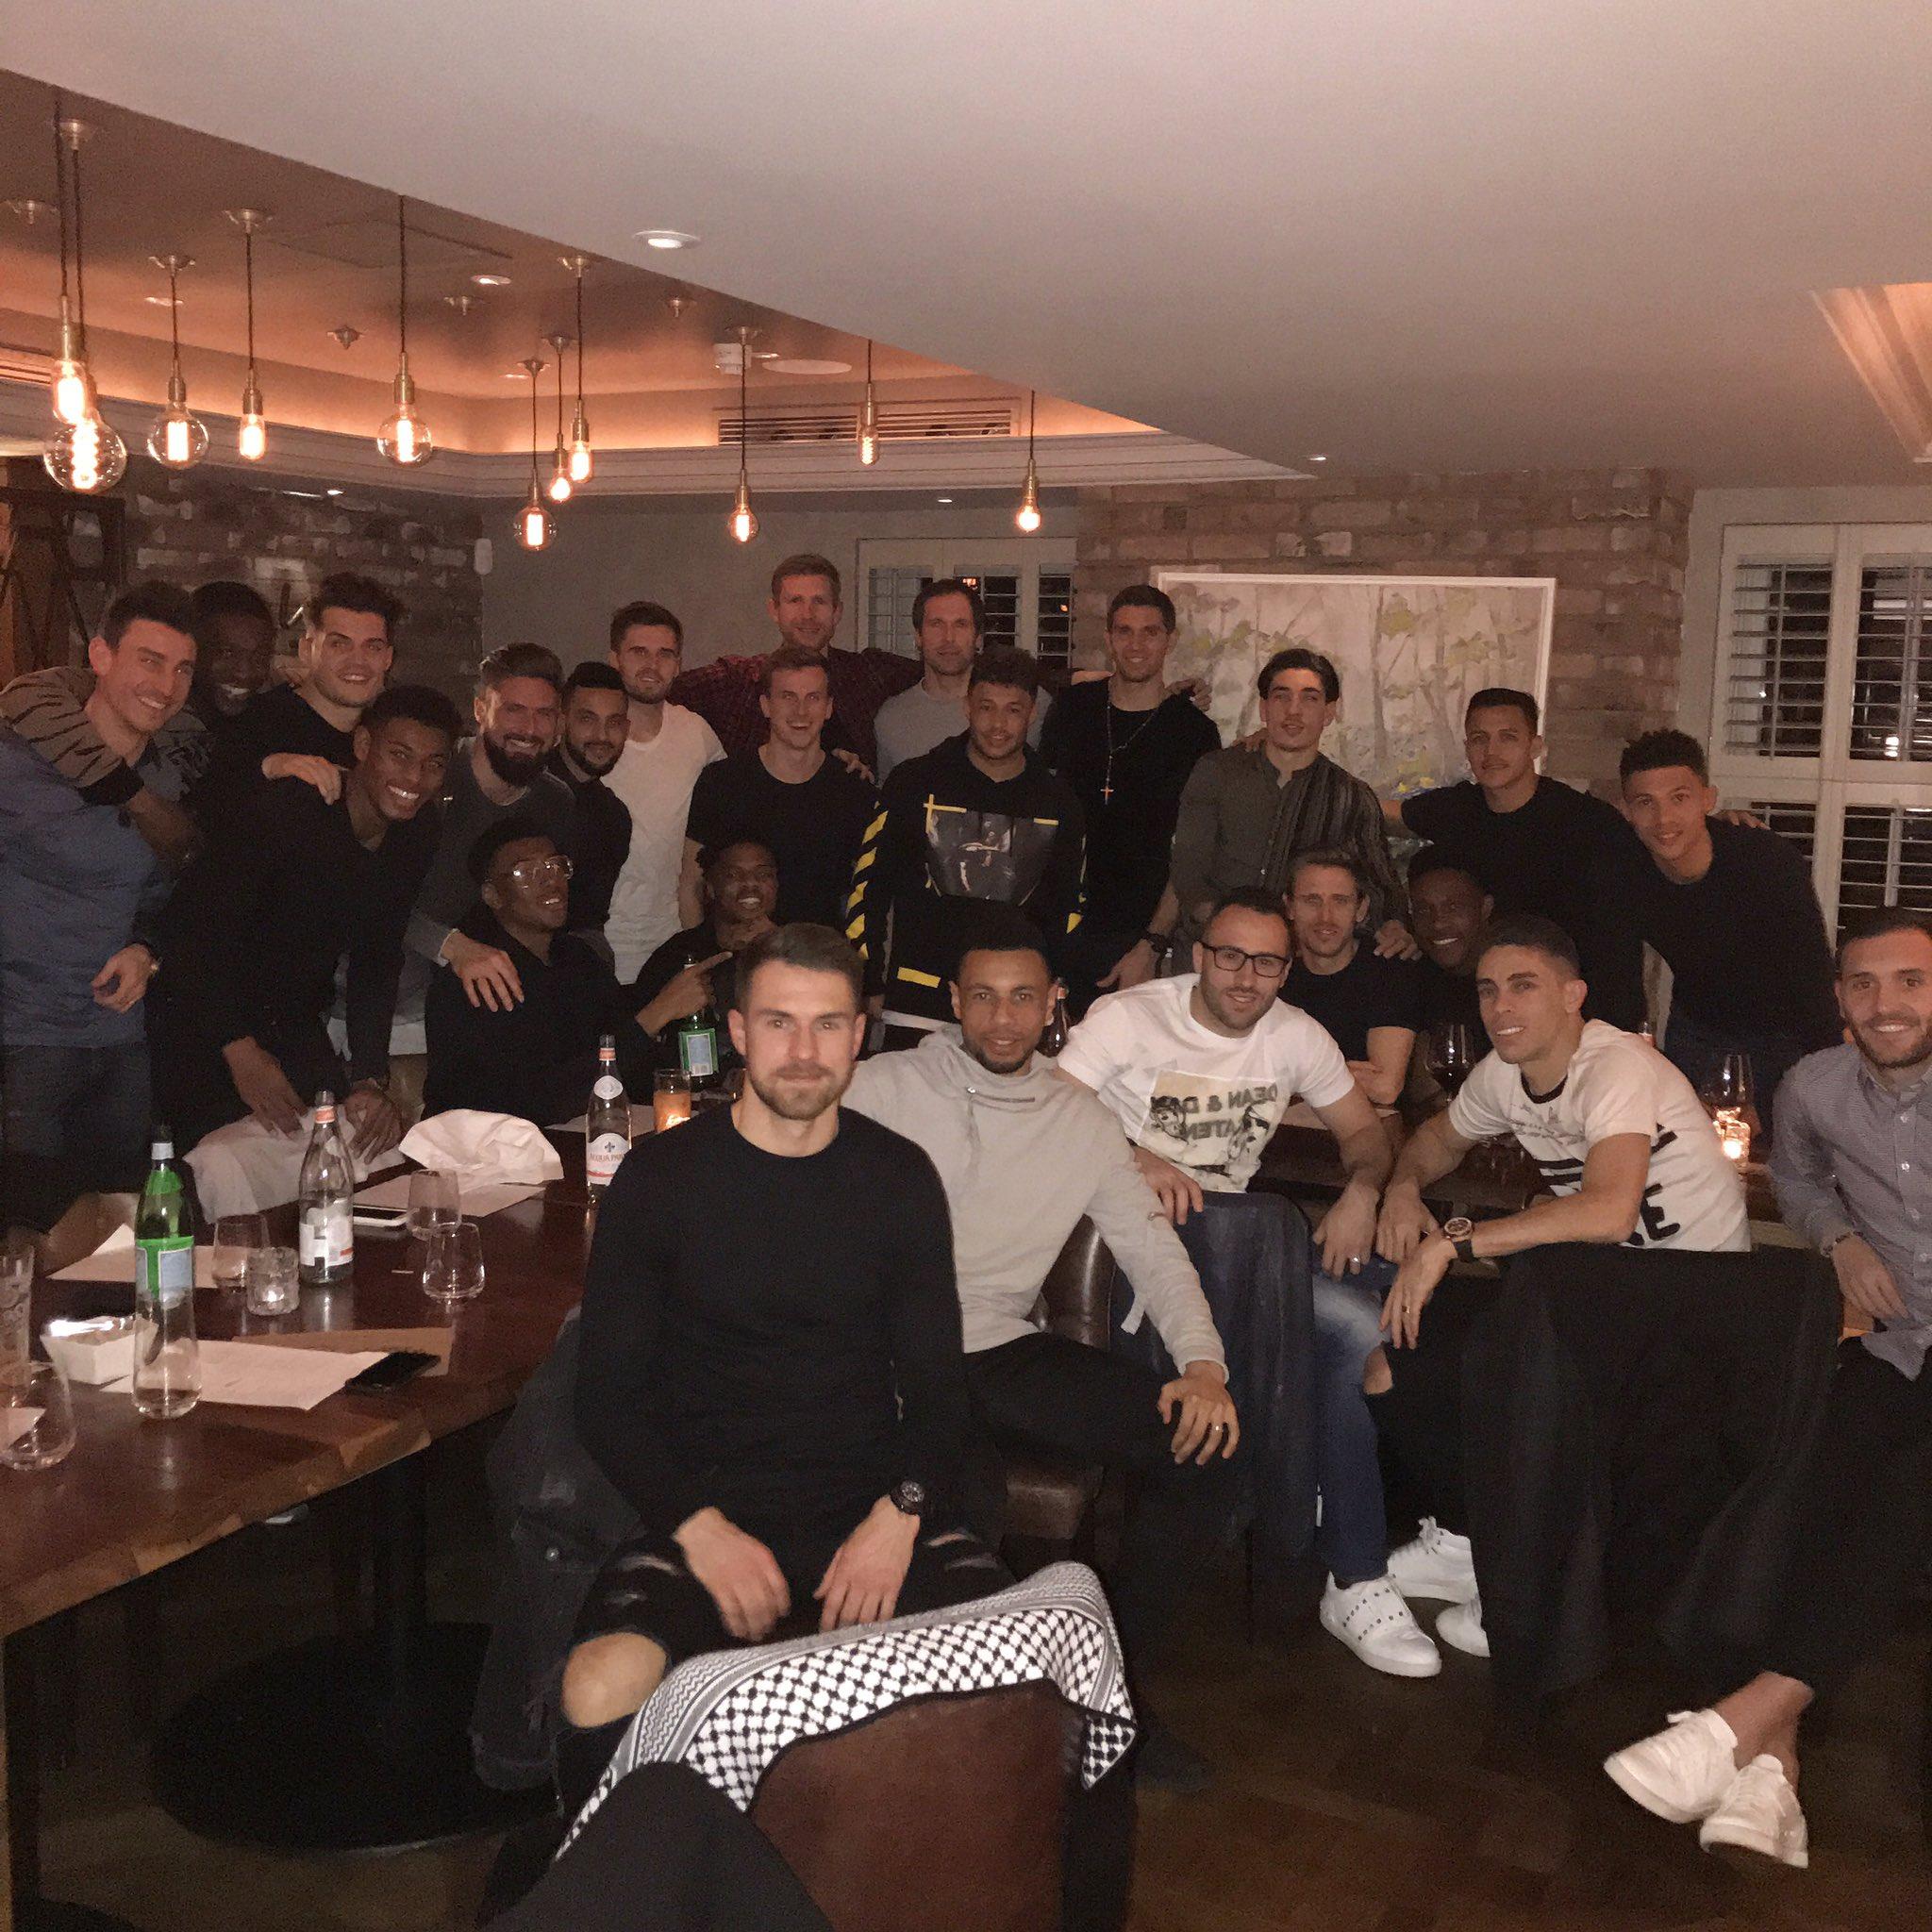 Yaya Sanogo spotted at Arsenal's team dinner